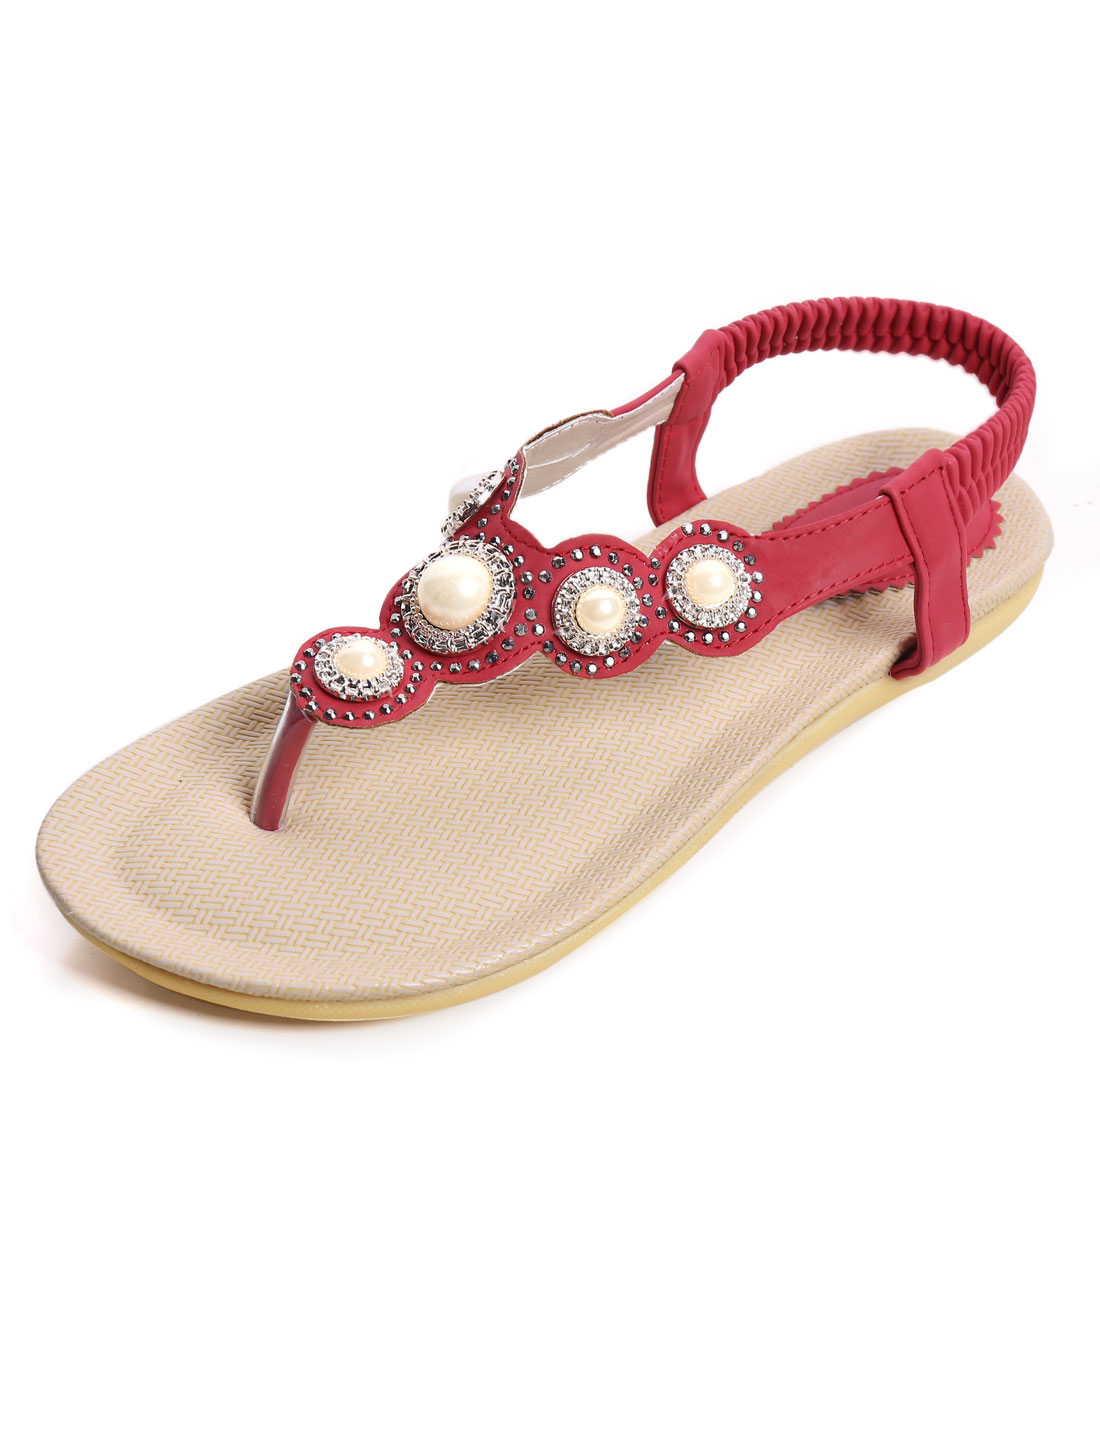 Lady Rhinestones Bead Decor Elastic Ankle Strap Sandals Red US 7.5